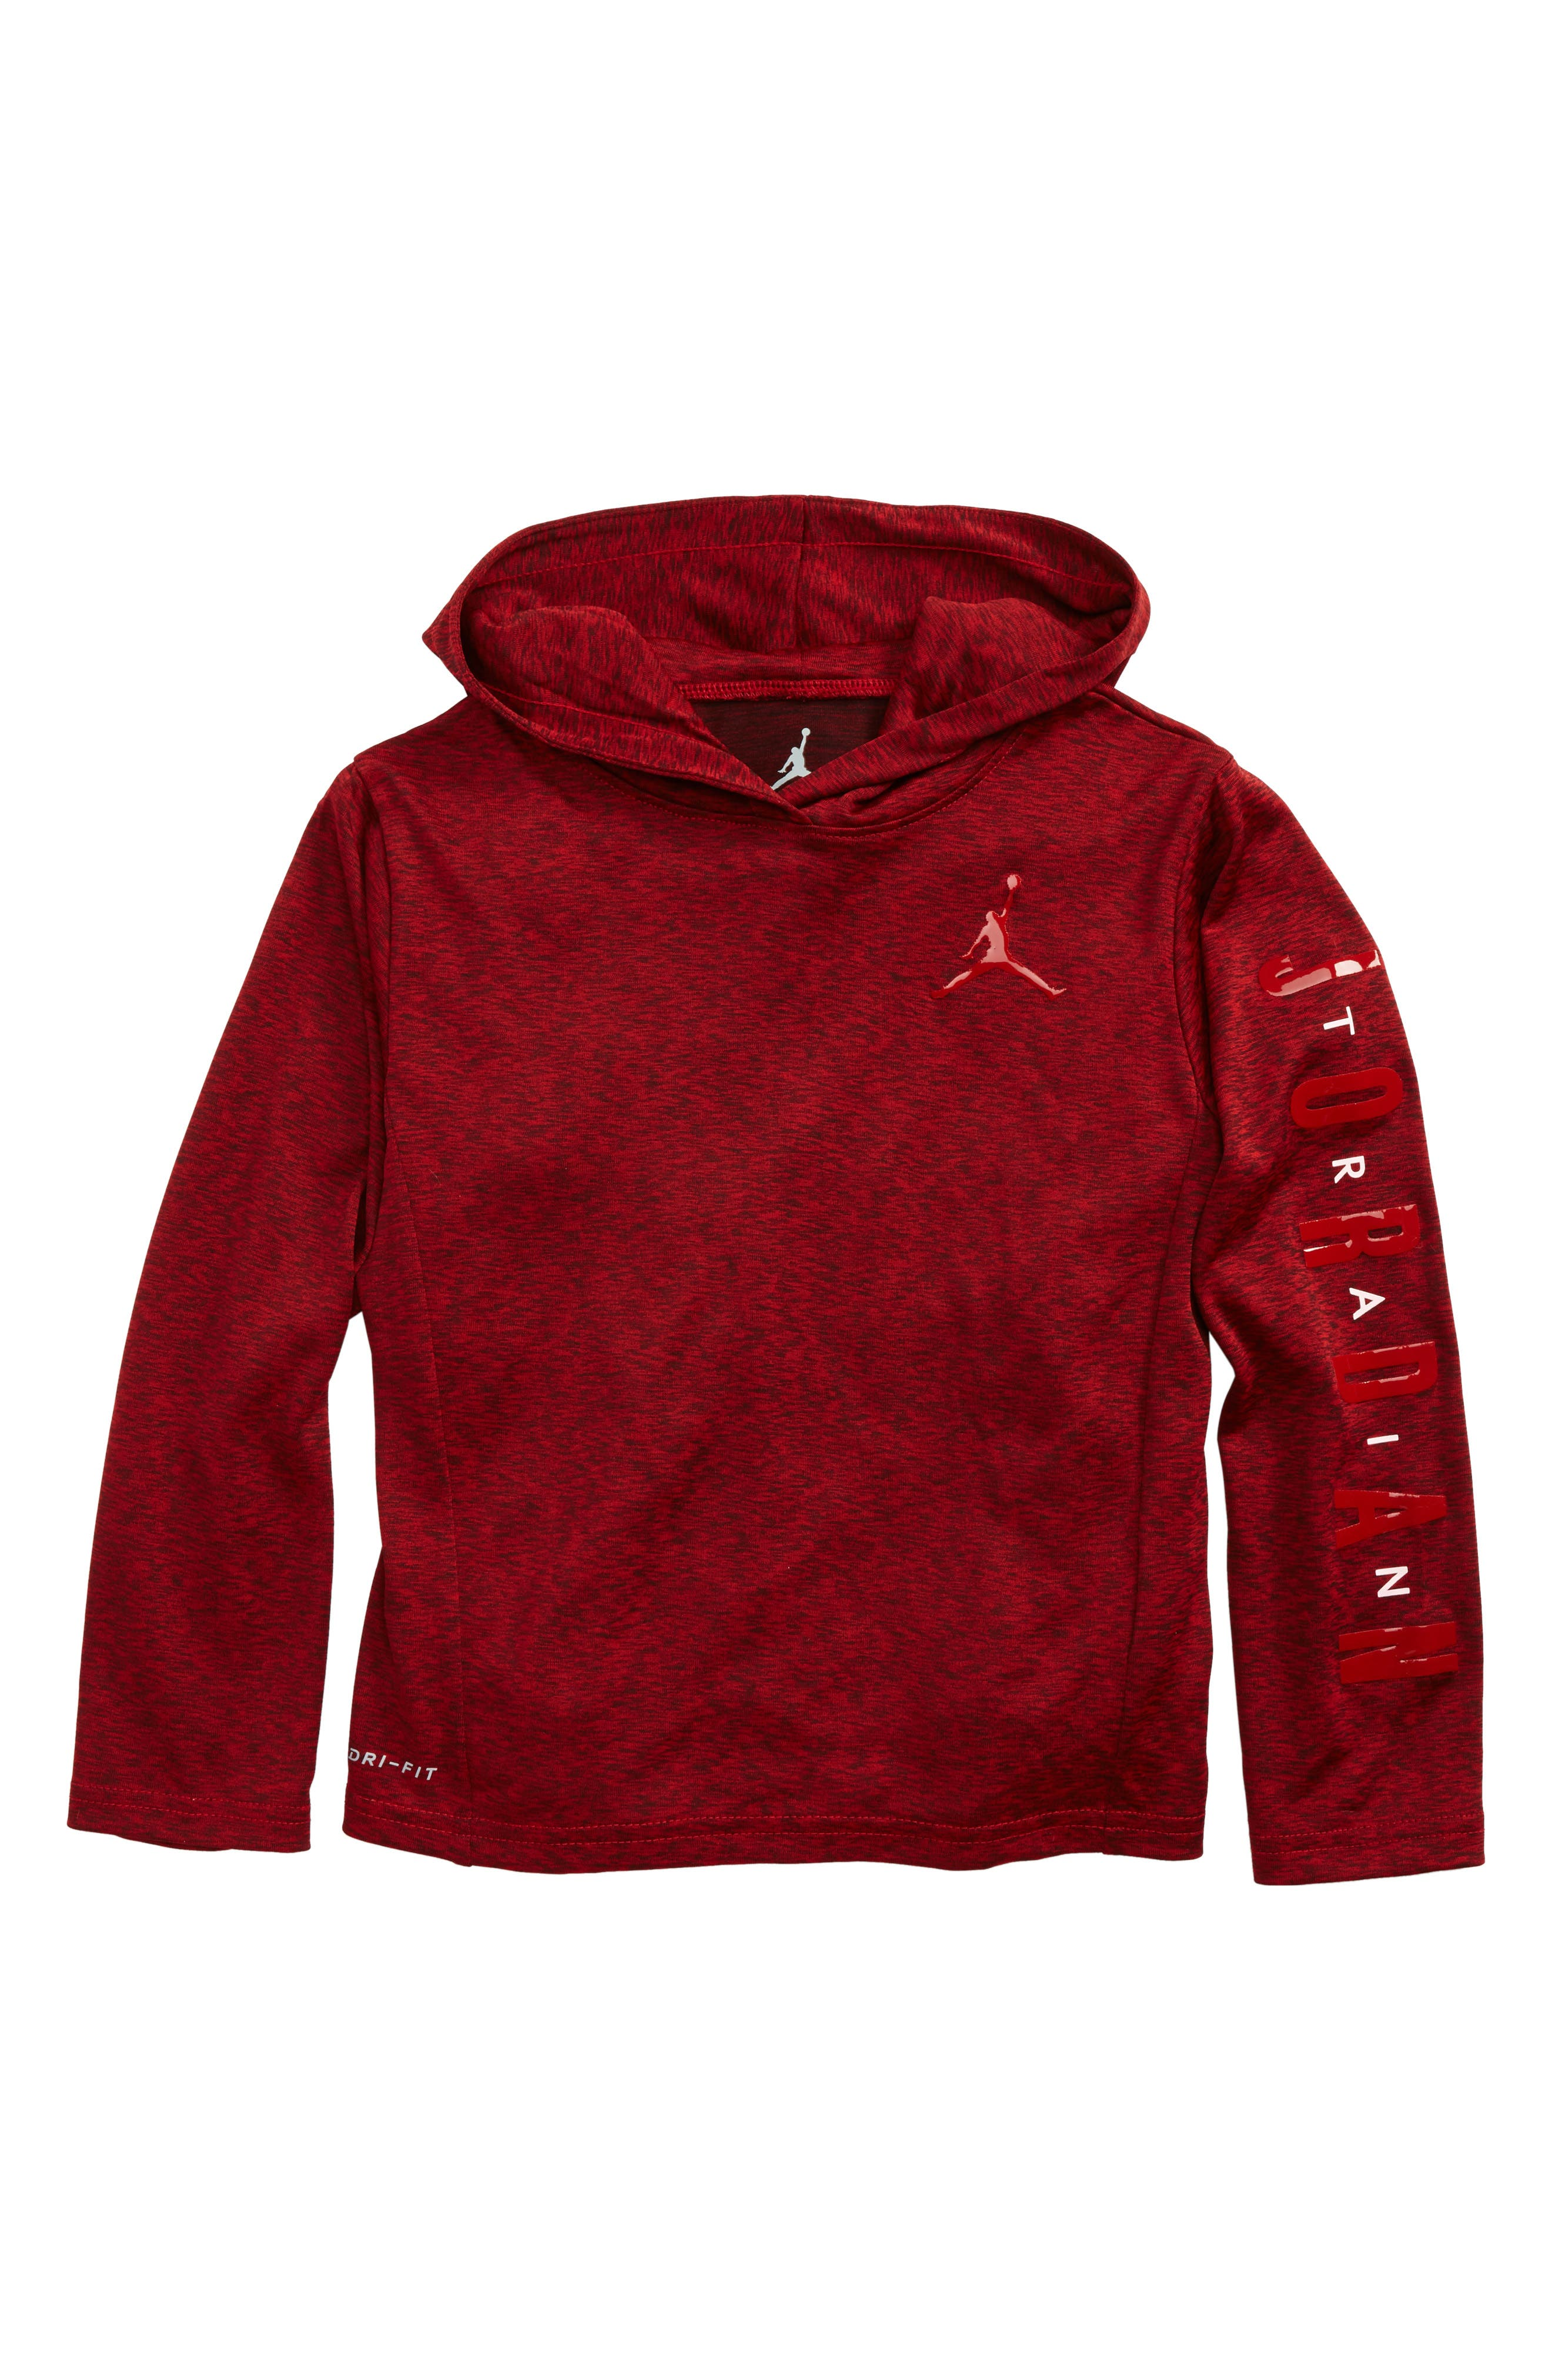 Jordan Dri-FIT Hooded T-Shirt,                             Main thumbnail 1, color,                             606